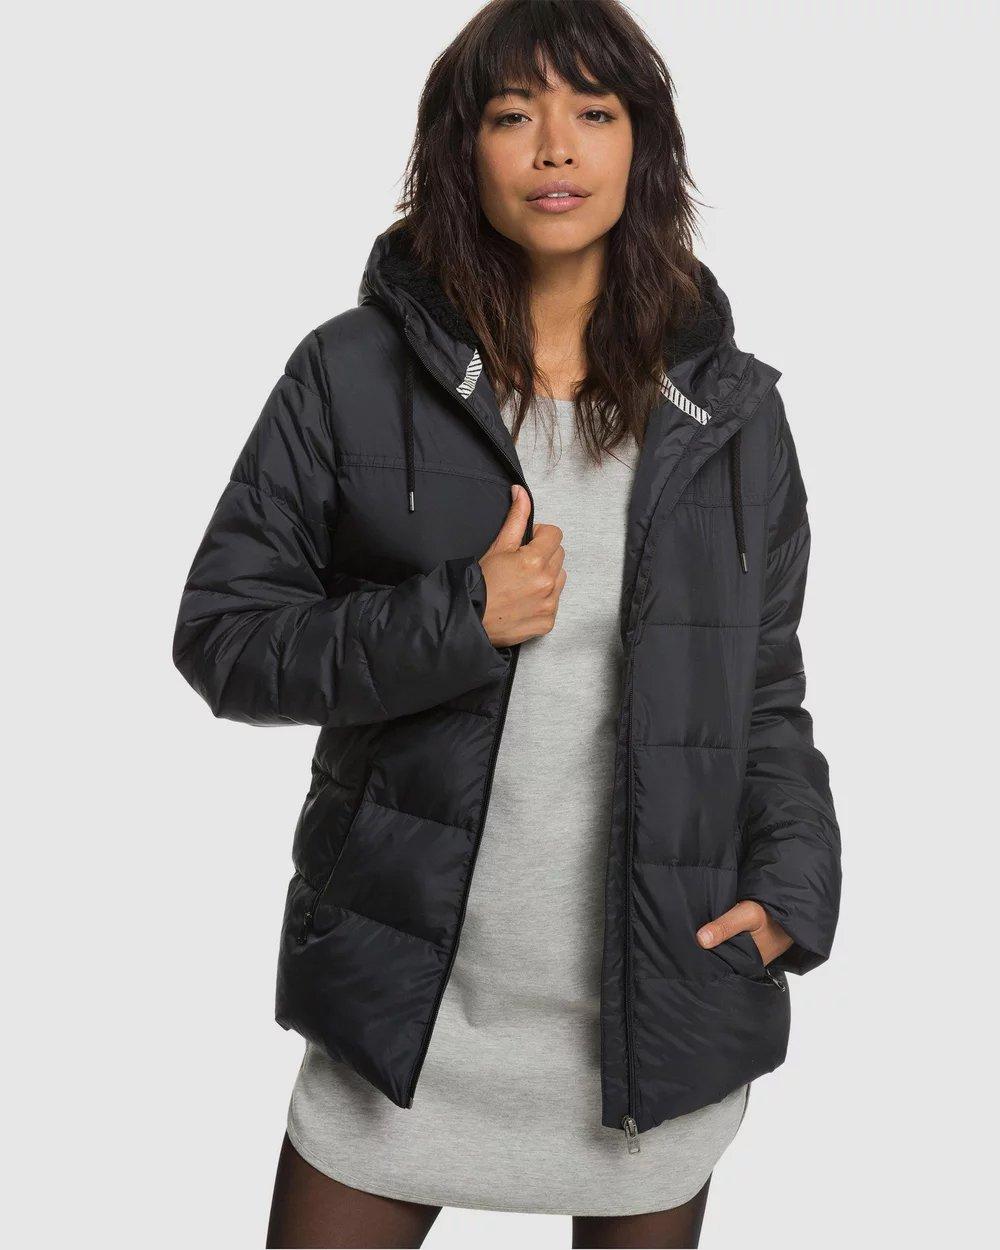 c4f8a075357 Идеи! Модных курток осень-зима 2019 2020 женские 110 фото новинки